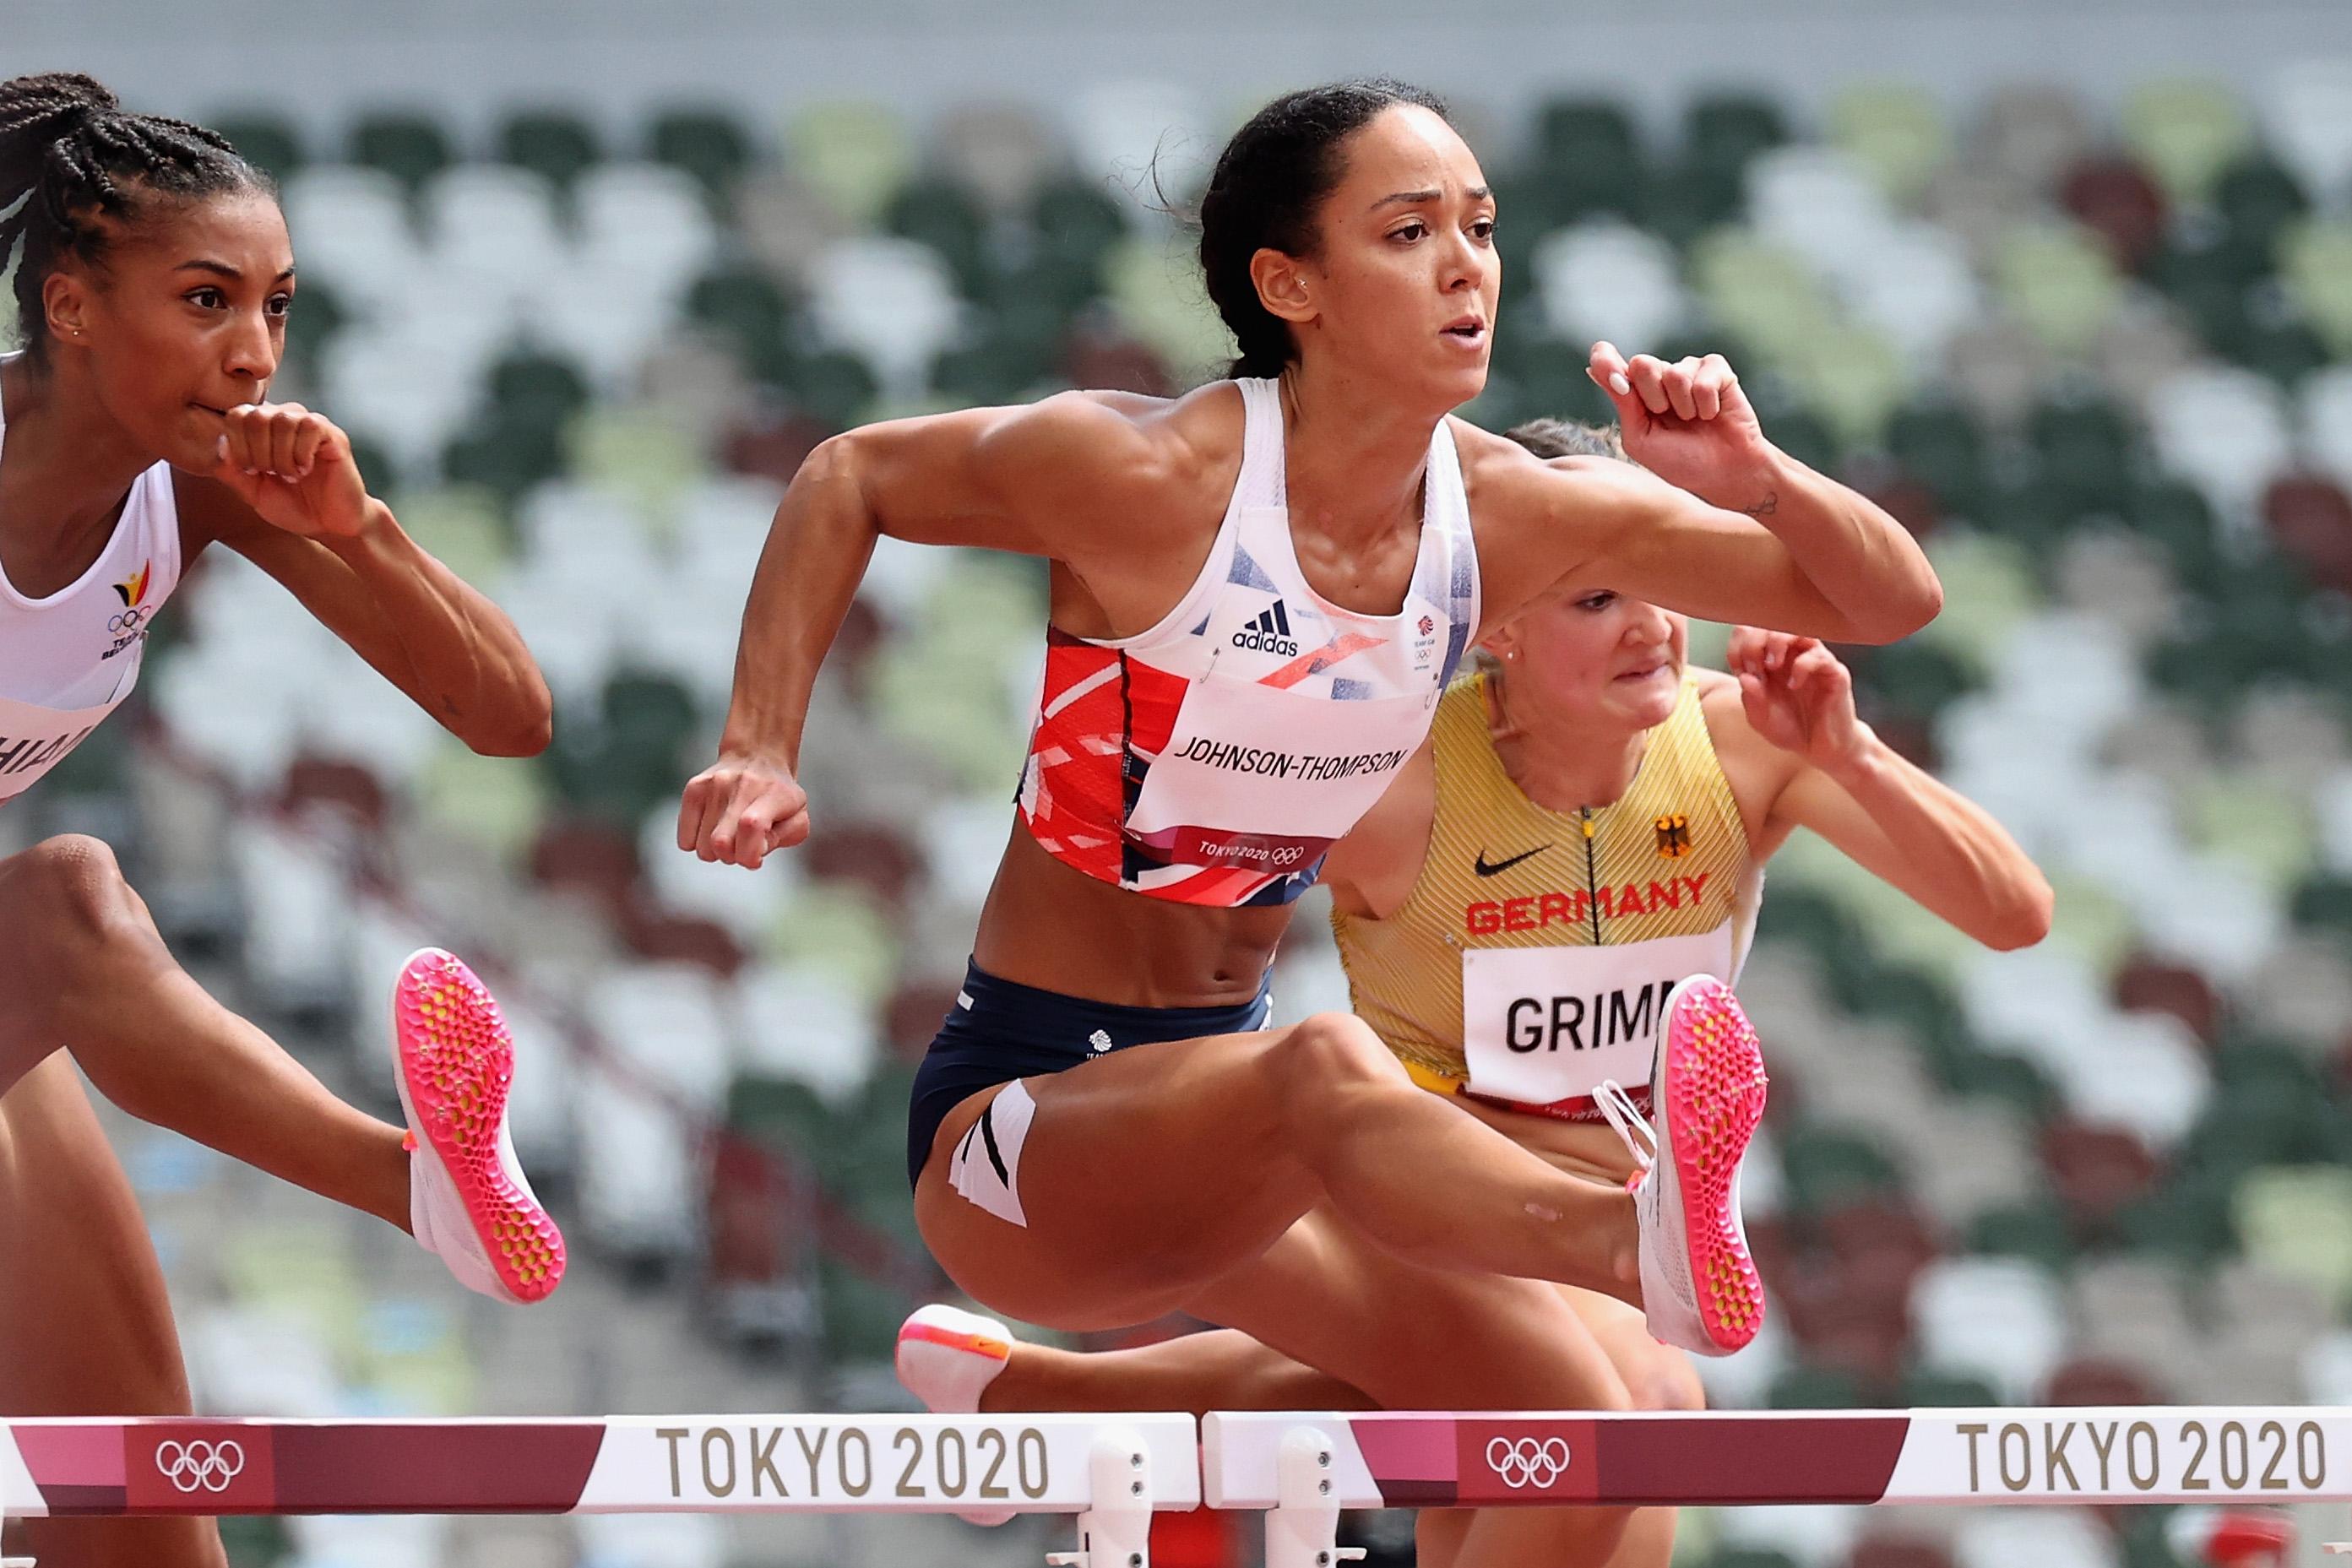 Katarina Johnson-Thompson at the 2020 Tokyo Olympics